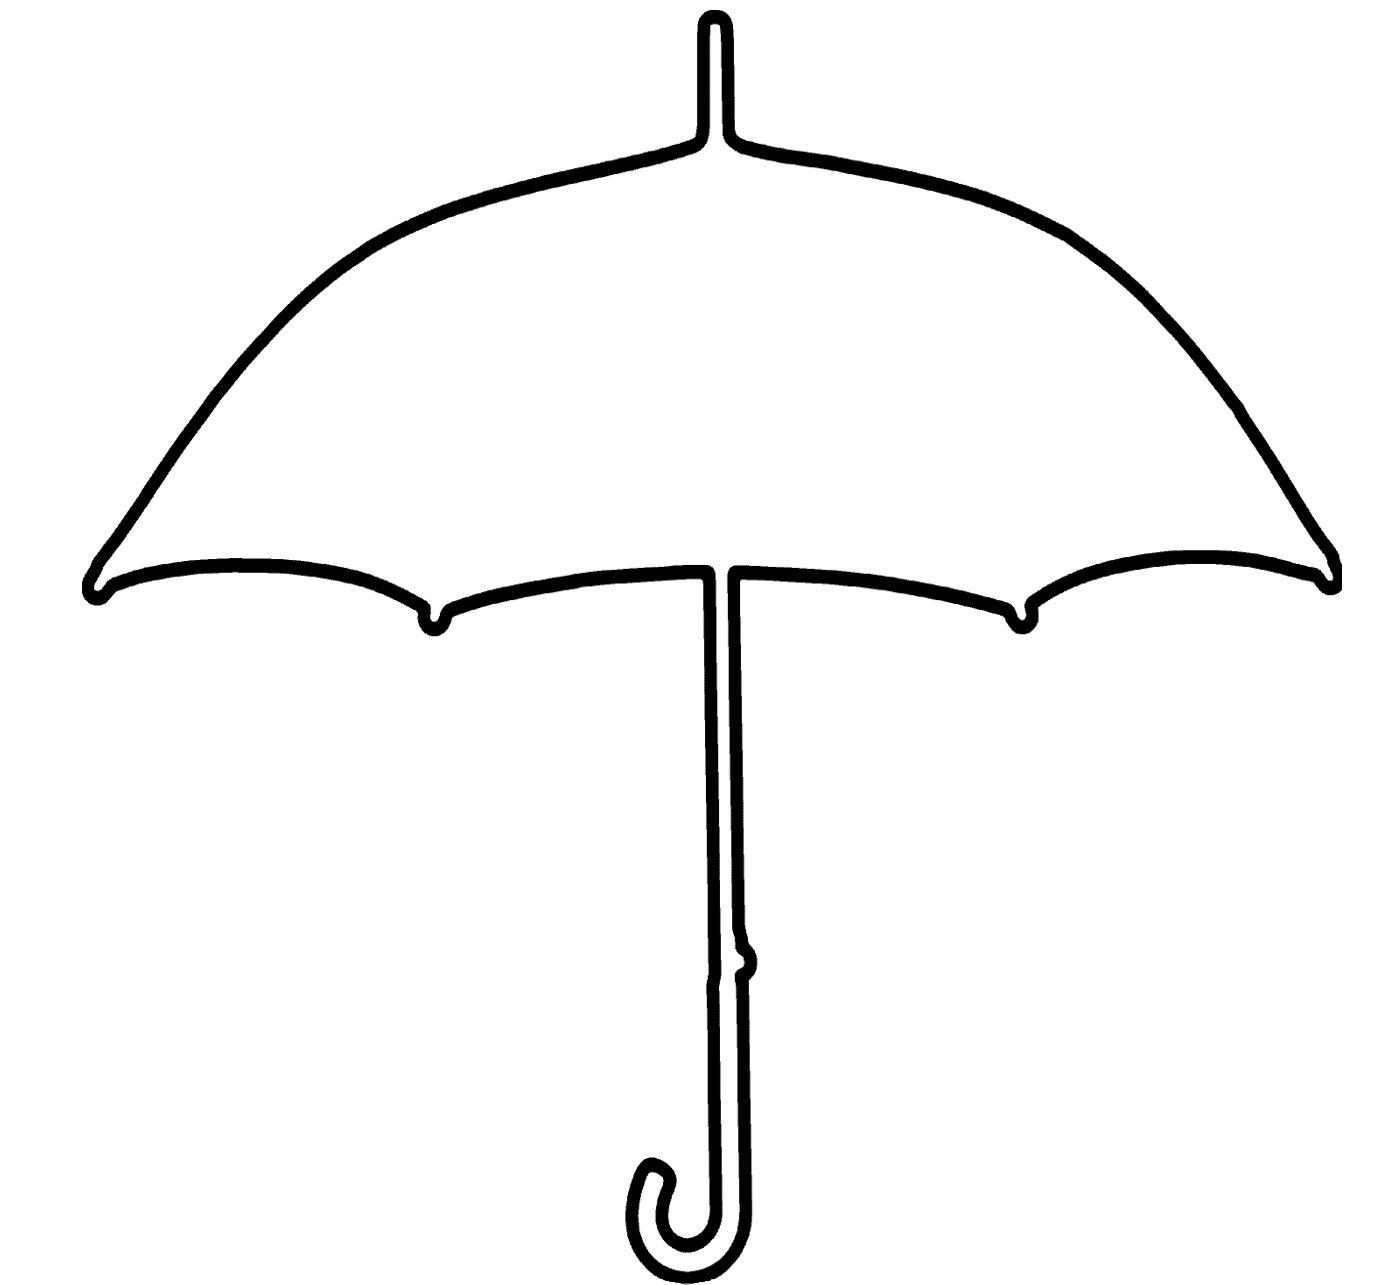 Black and white outdoor umbrella